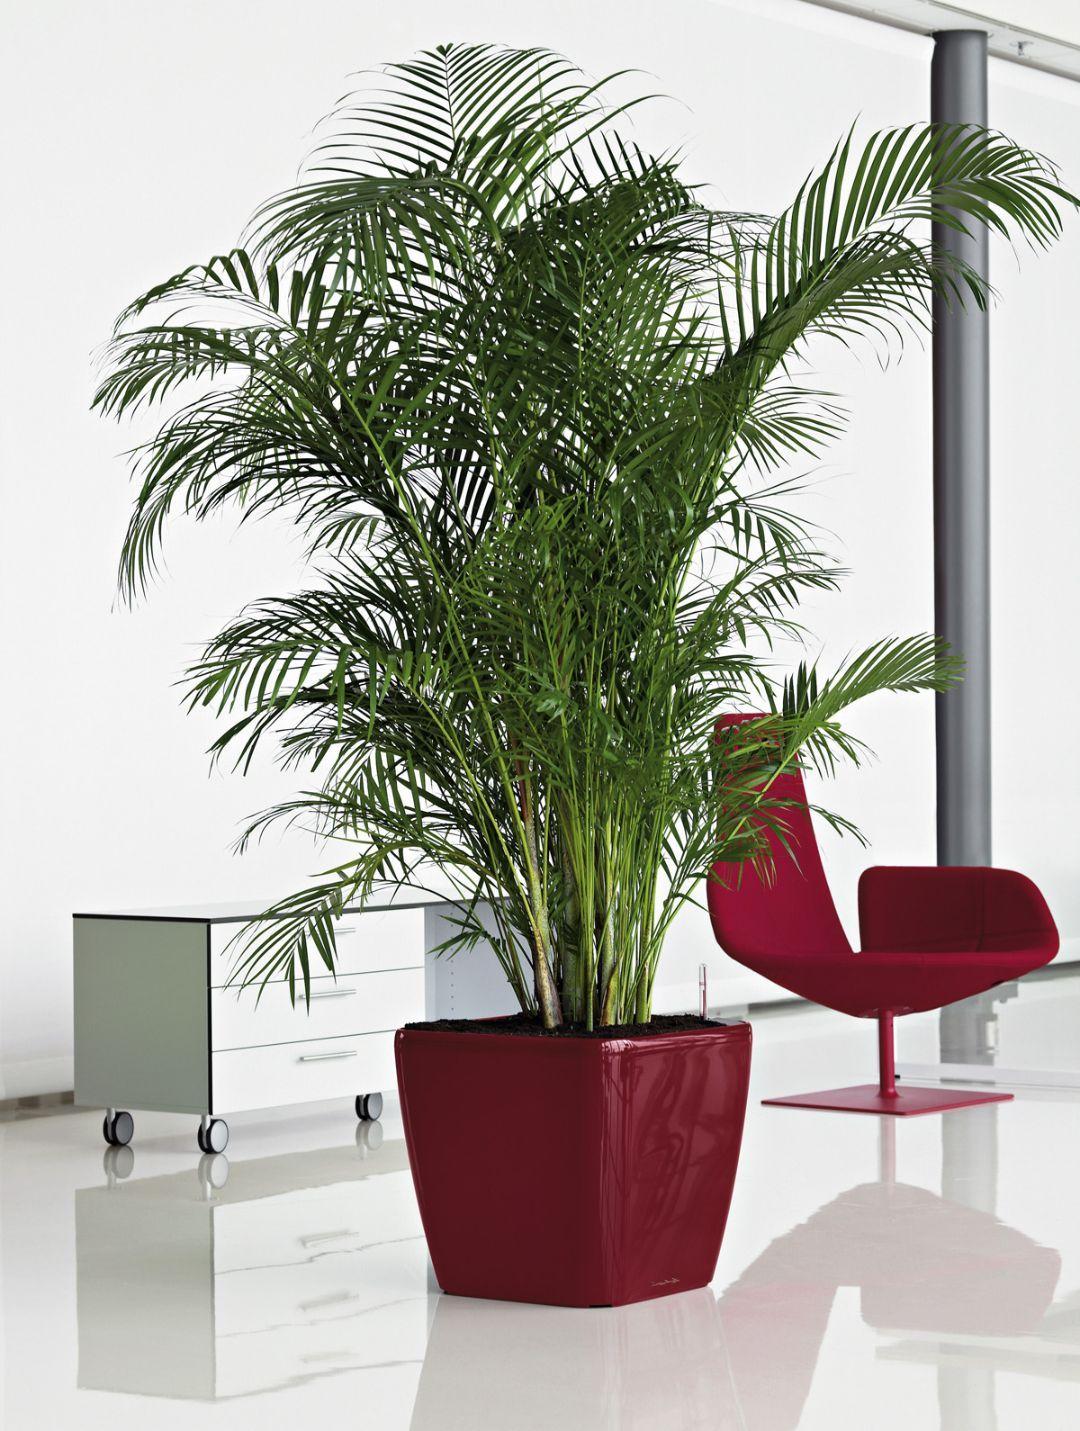 Plantas para oficina | Macetas | Pinterest | Plantas para oficina ...